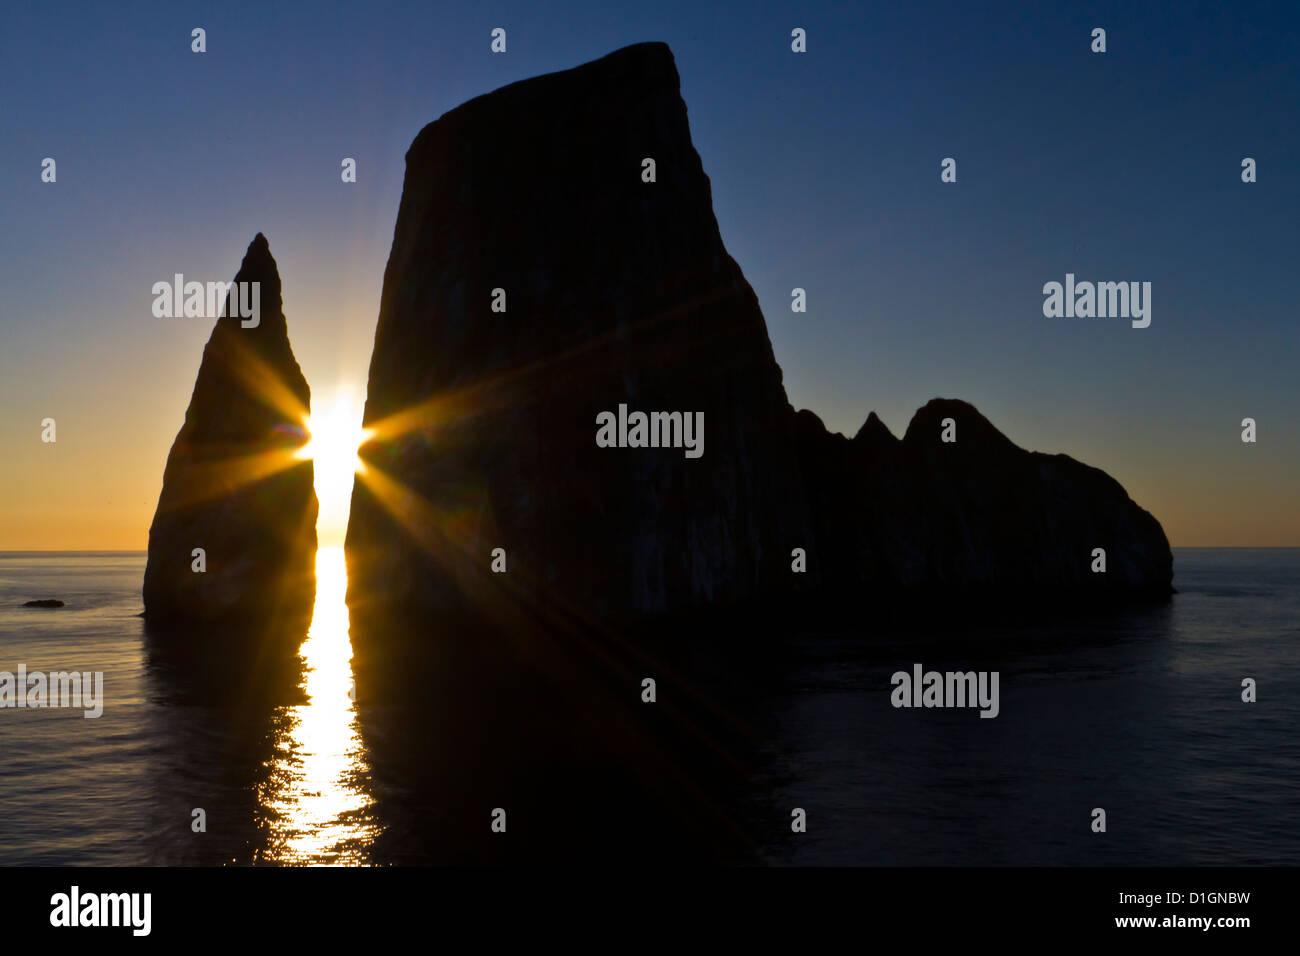 Leon Dormido (Sleeping Lion Island), Galapagos Islands, UNESCO World Heritage Site, Ecuador, South America - Stock Image